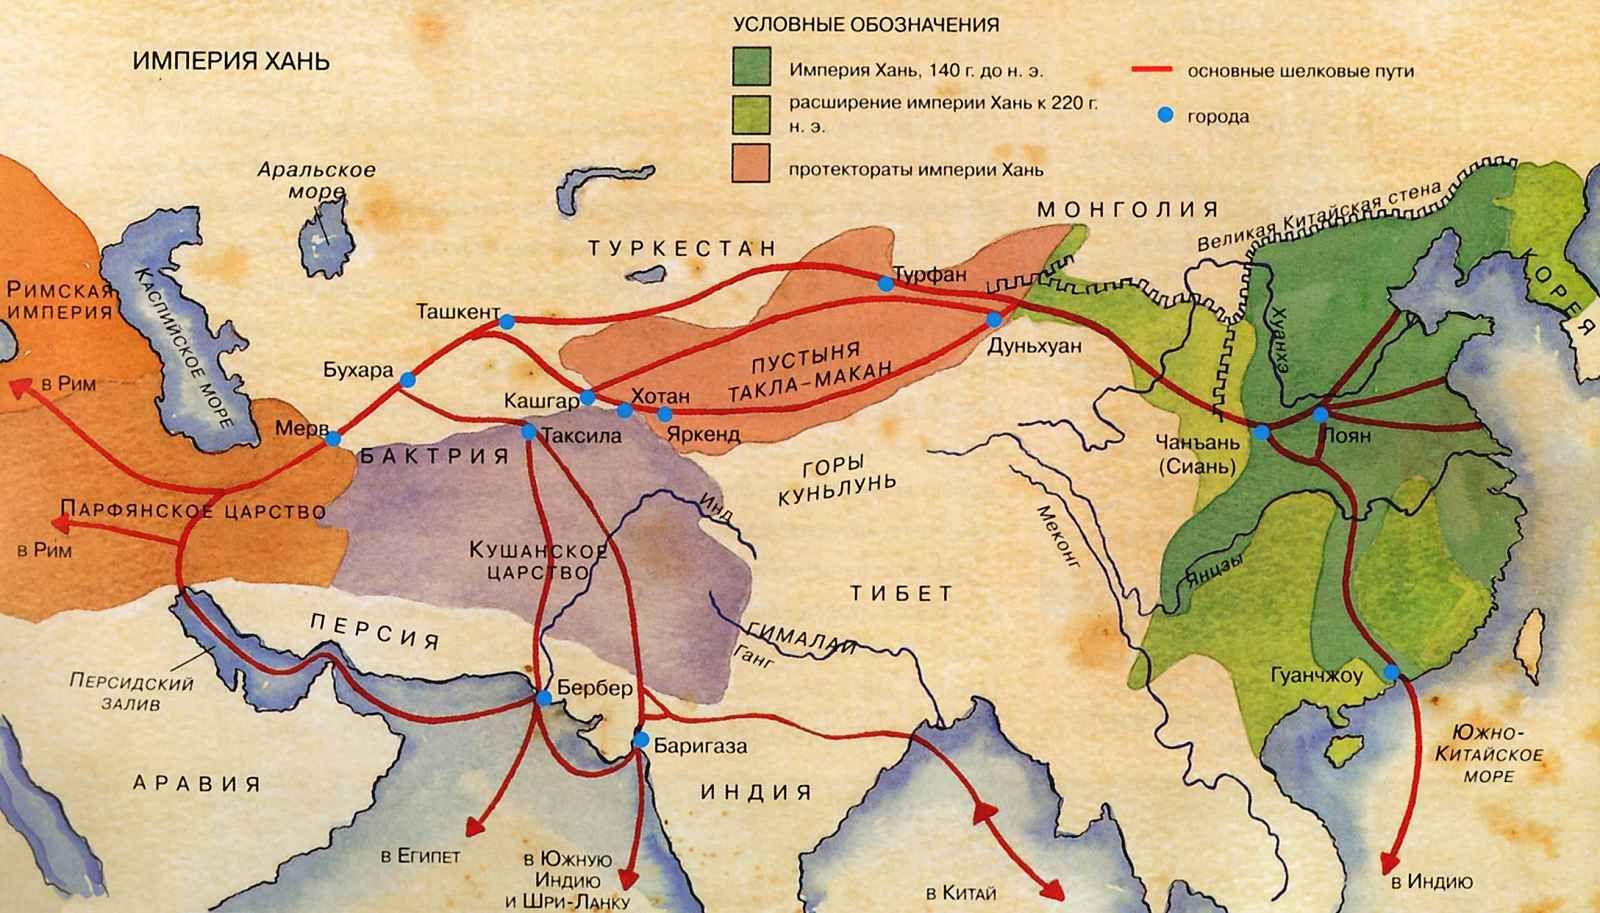 Migration To Xinjiang